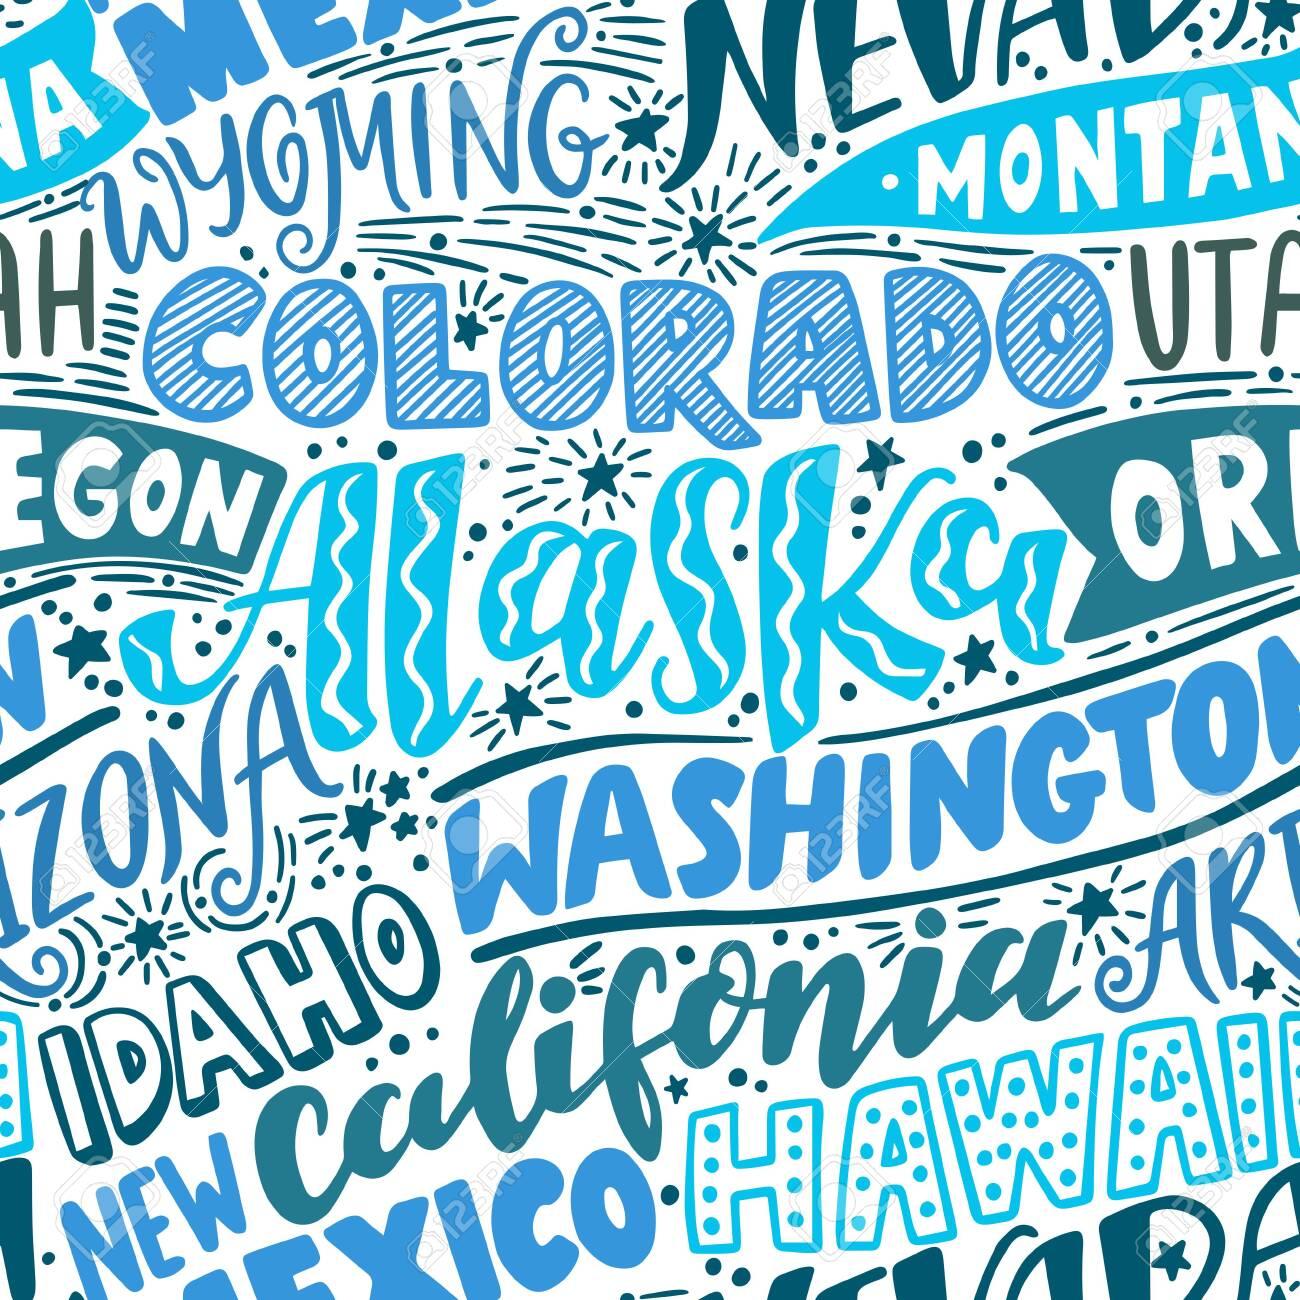 Vector seamless pattern with USA states. Washington, California, Oregon, Alaska, Colorado, Wyoming, Nevada, Montana, Utah, Idaho, Arizona, Hawaii, New Mexico - 151065125